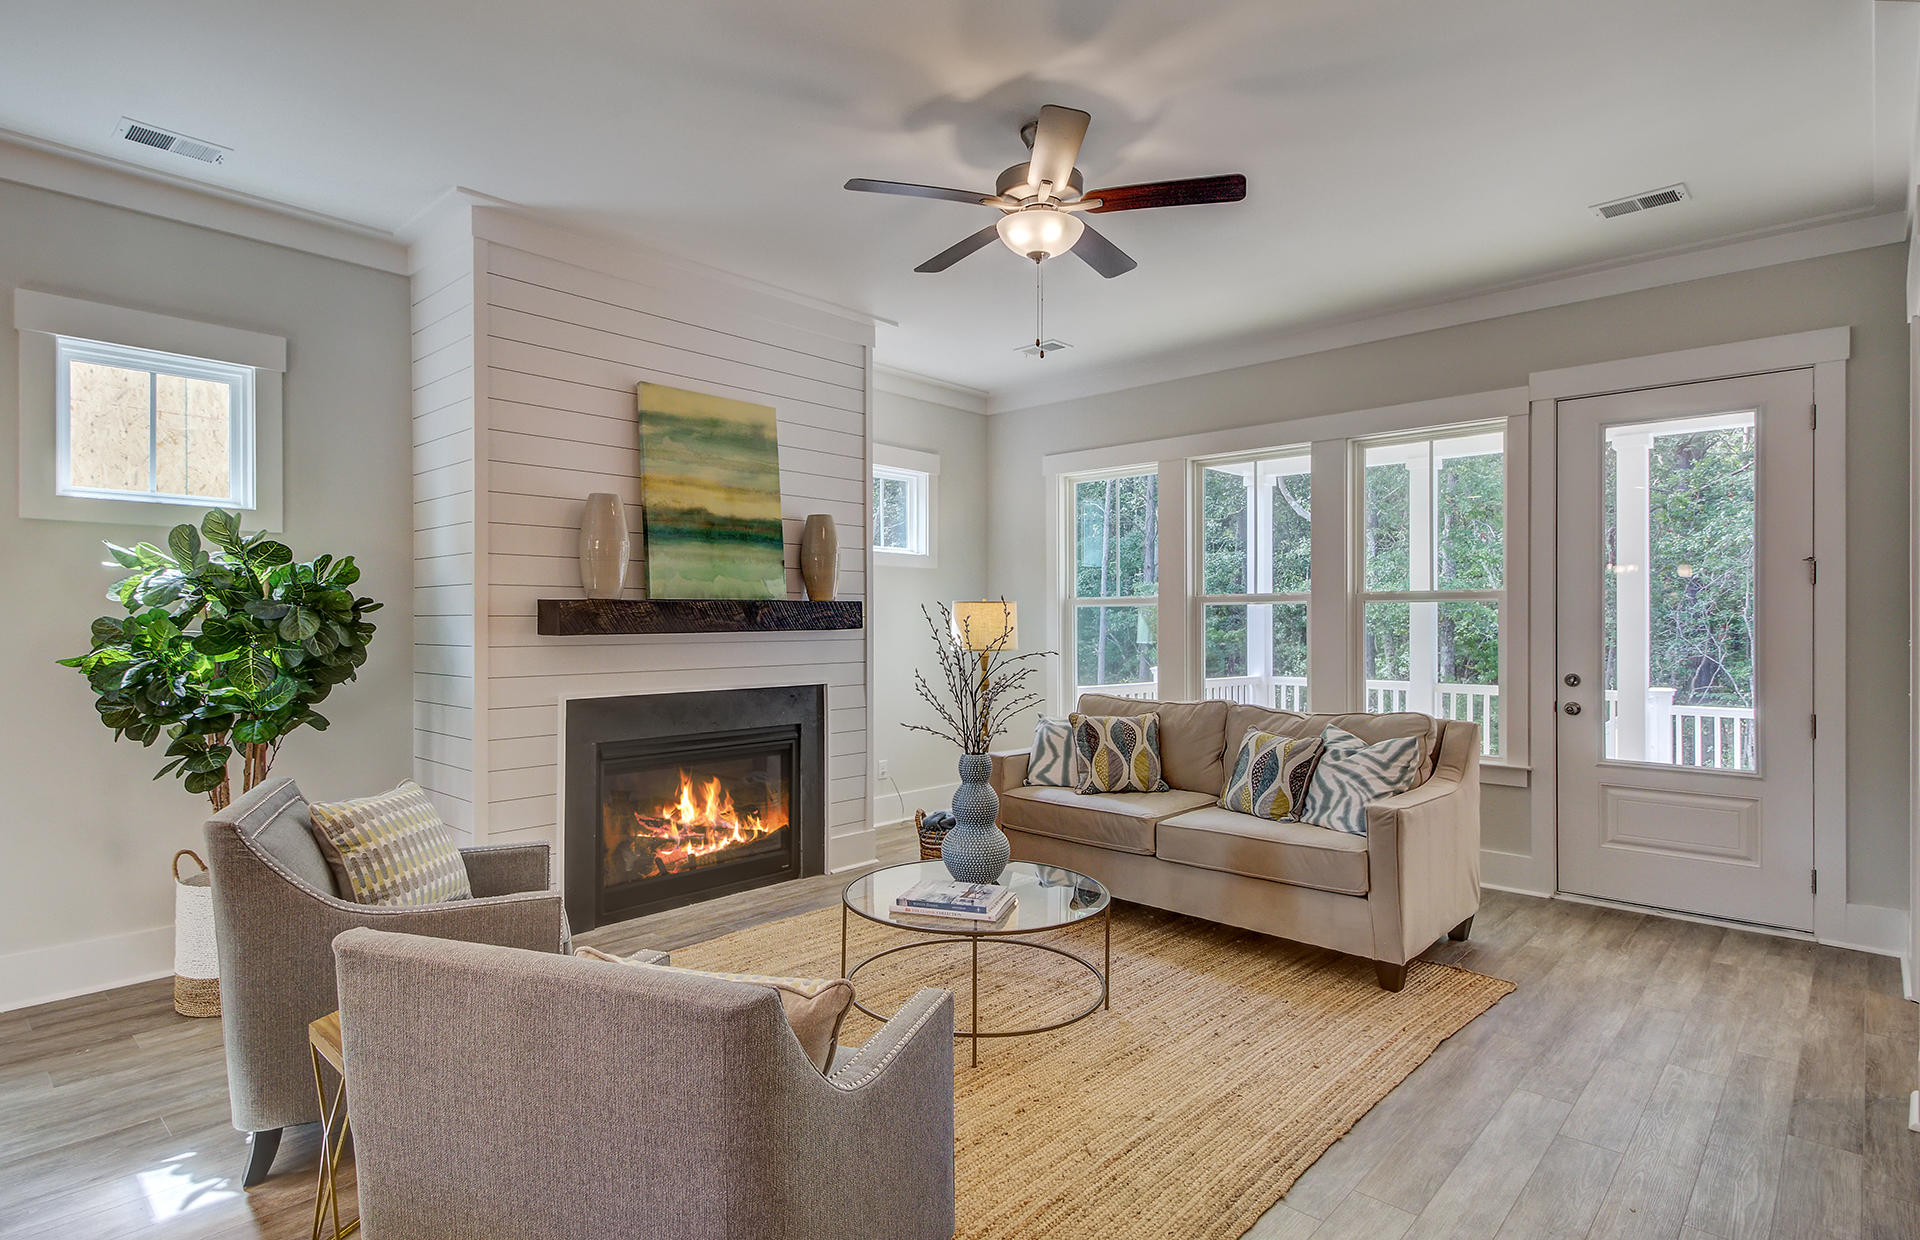 Fulton Park Homes For Sale - 1282 Max, Mount Pleasant, SC - 29